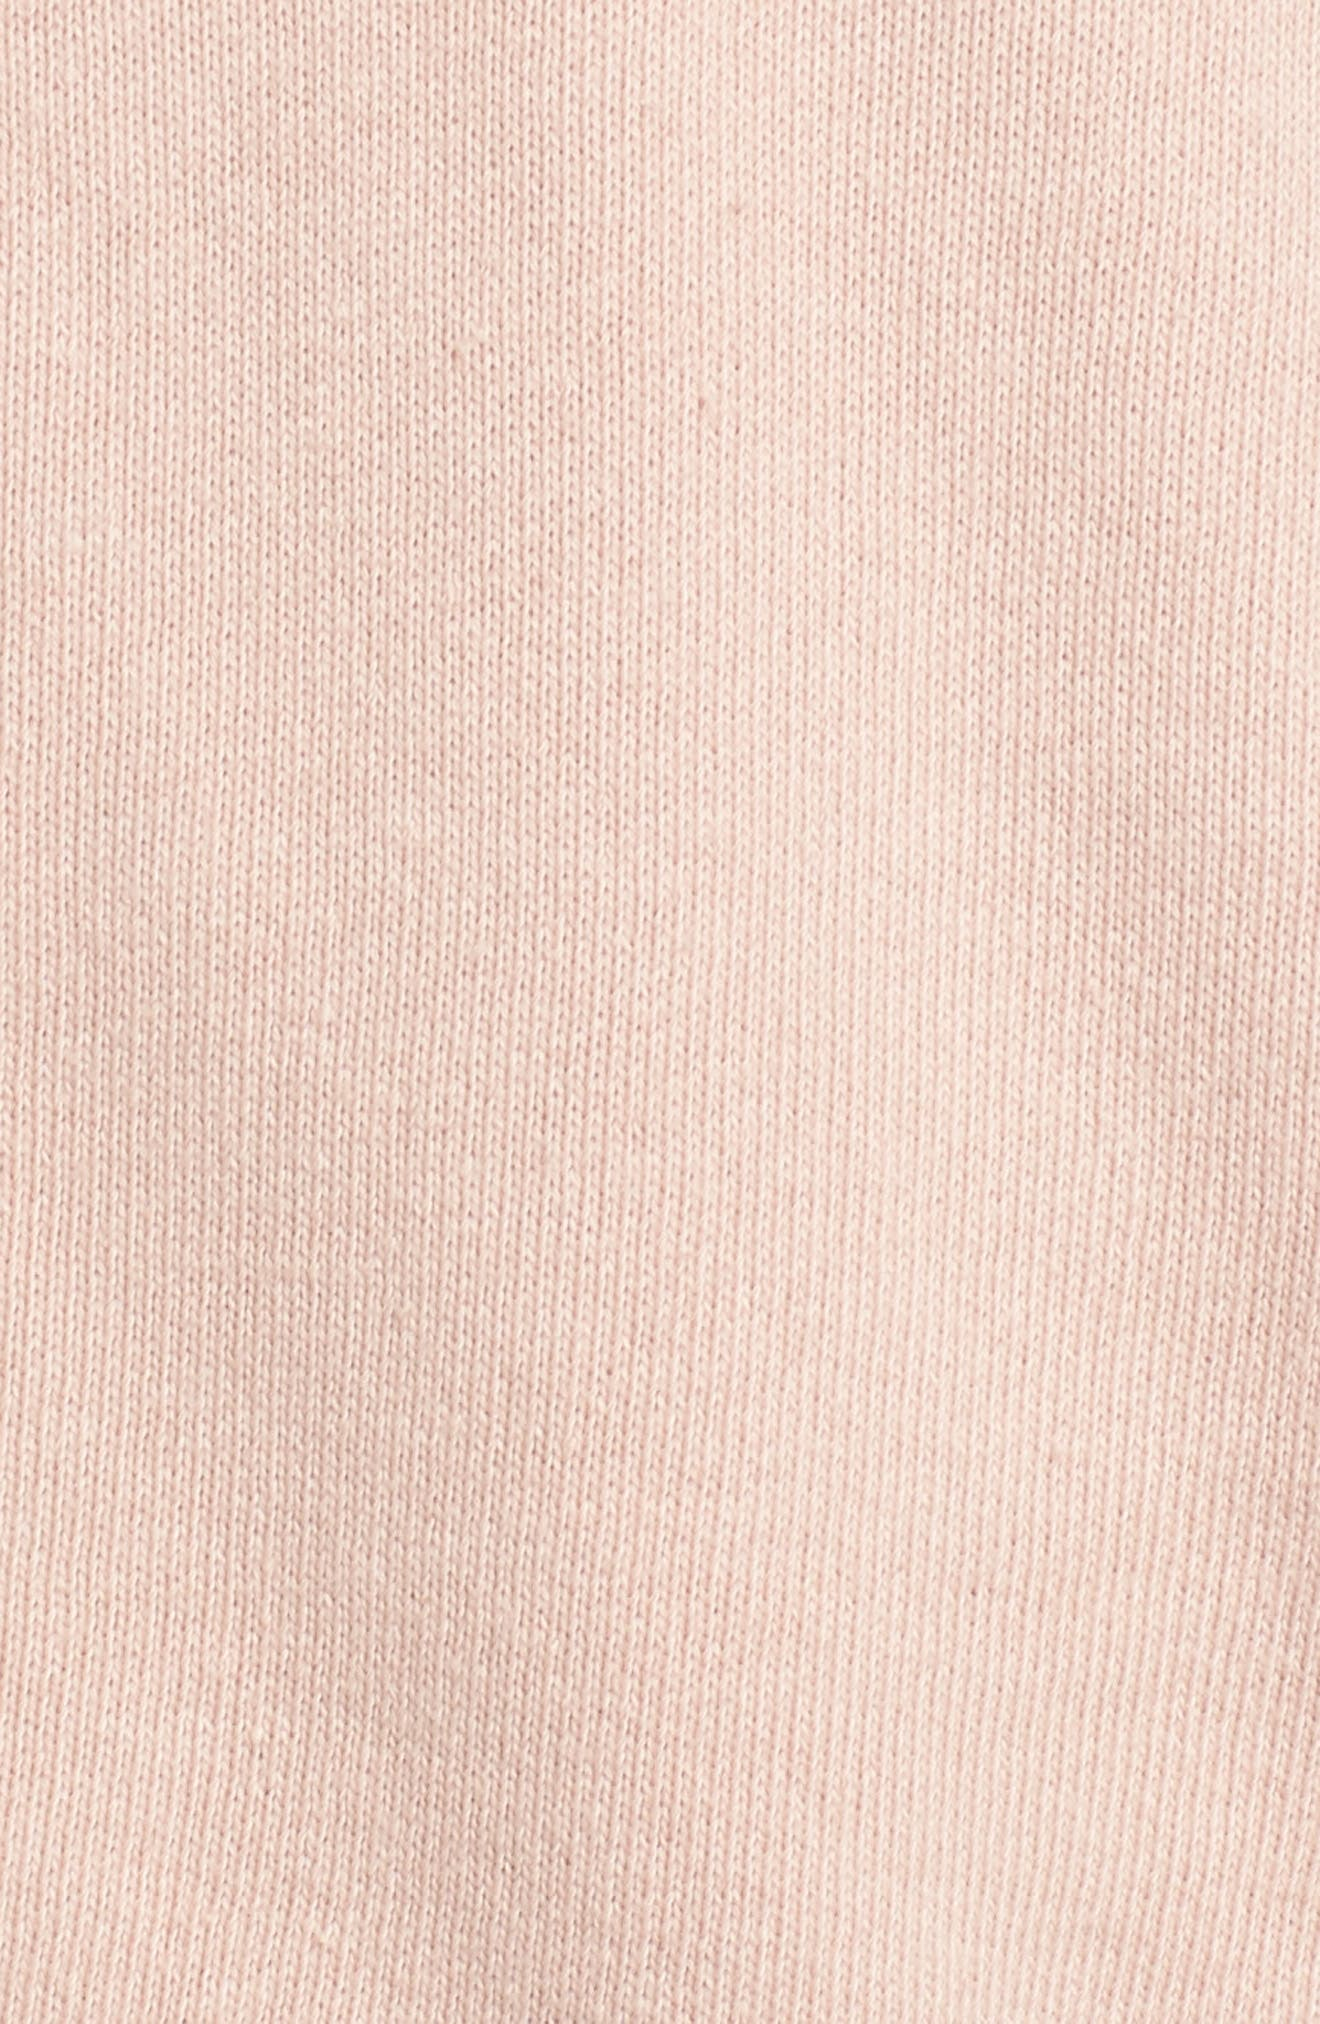 Cold Shoulder Hoodie,                             Alternate thumbnail 5, color,                             Pink Beige